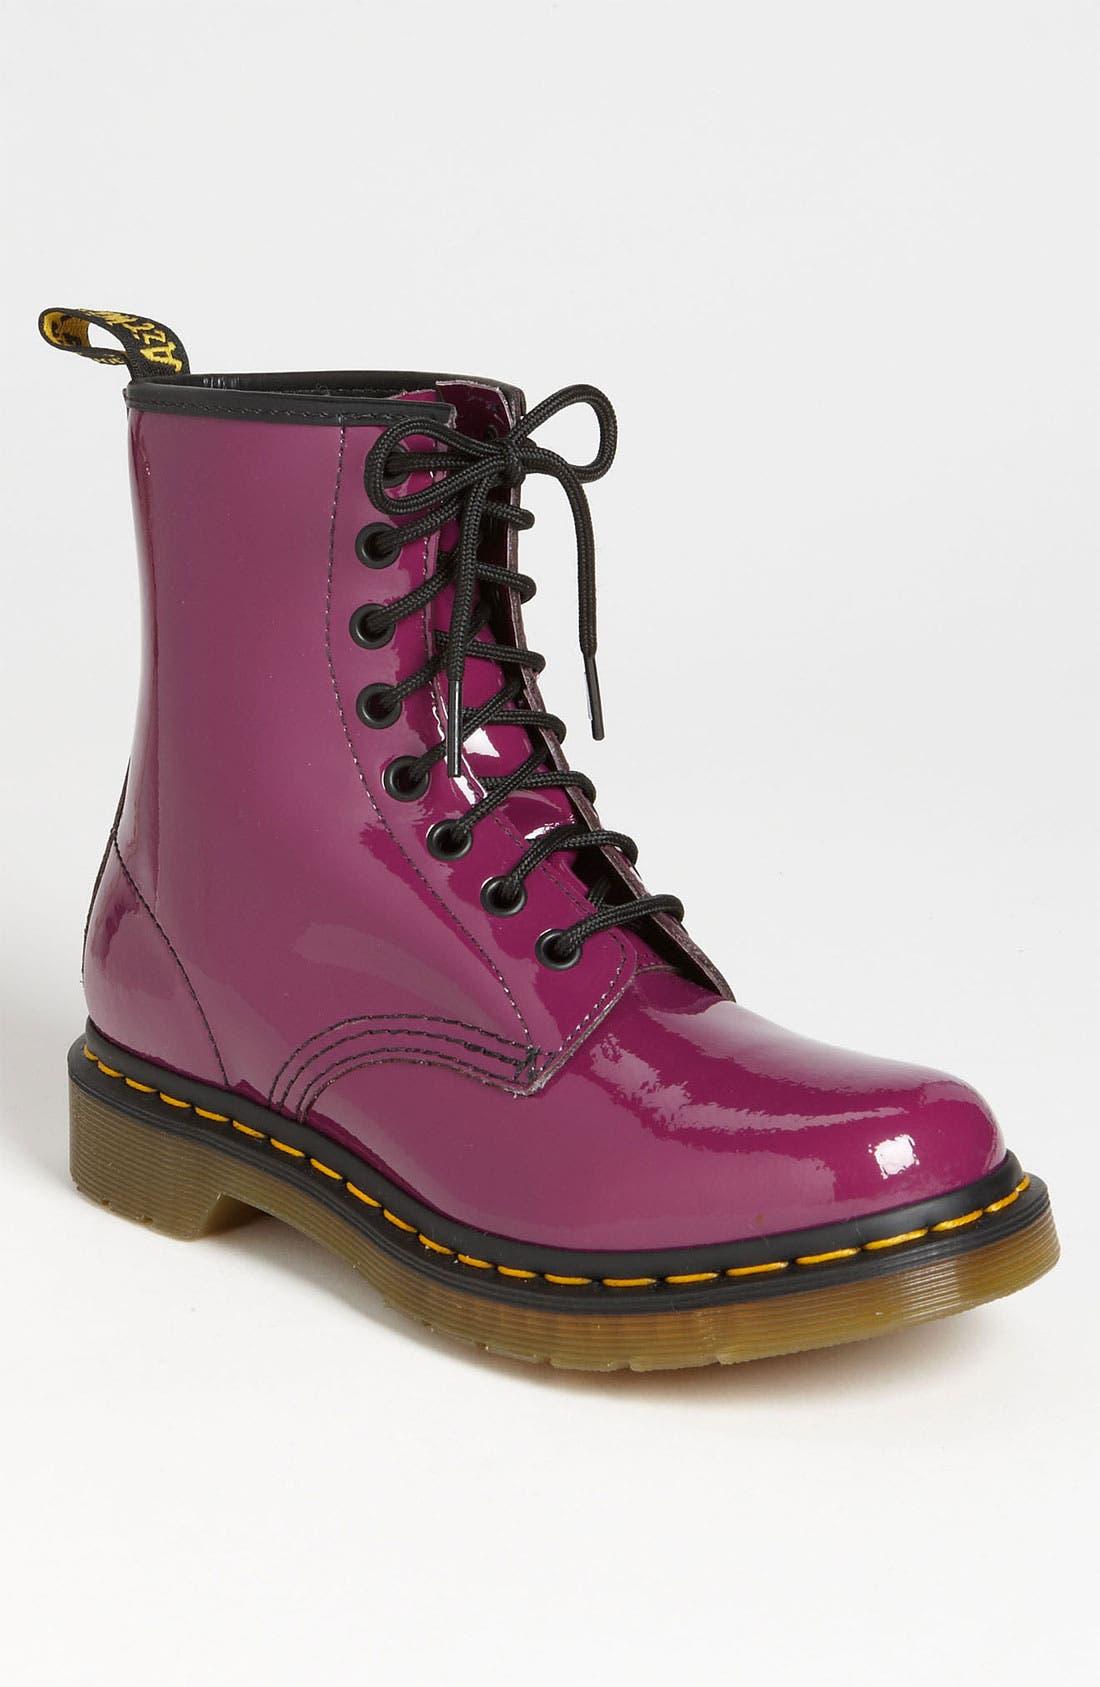 Alternate Image 1 Selected - Dr. Martens '1460' Boot